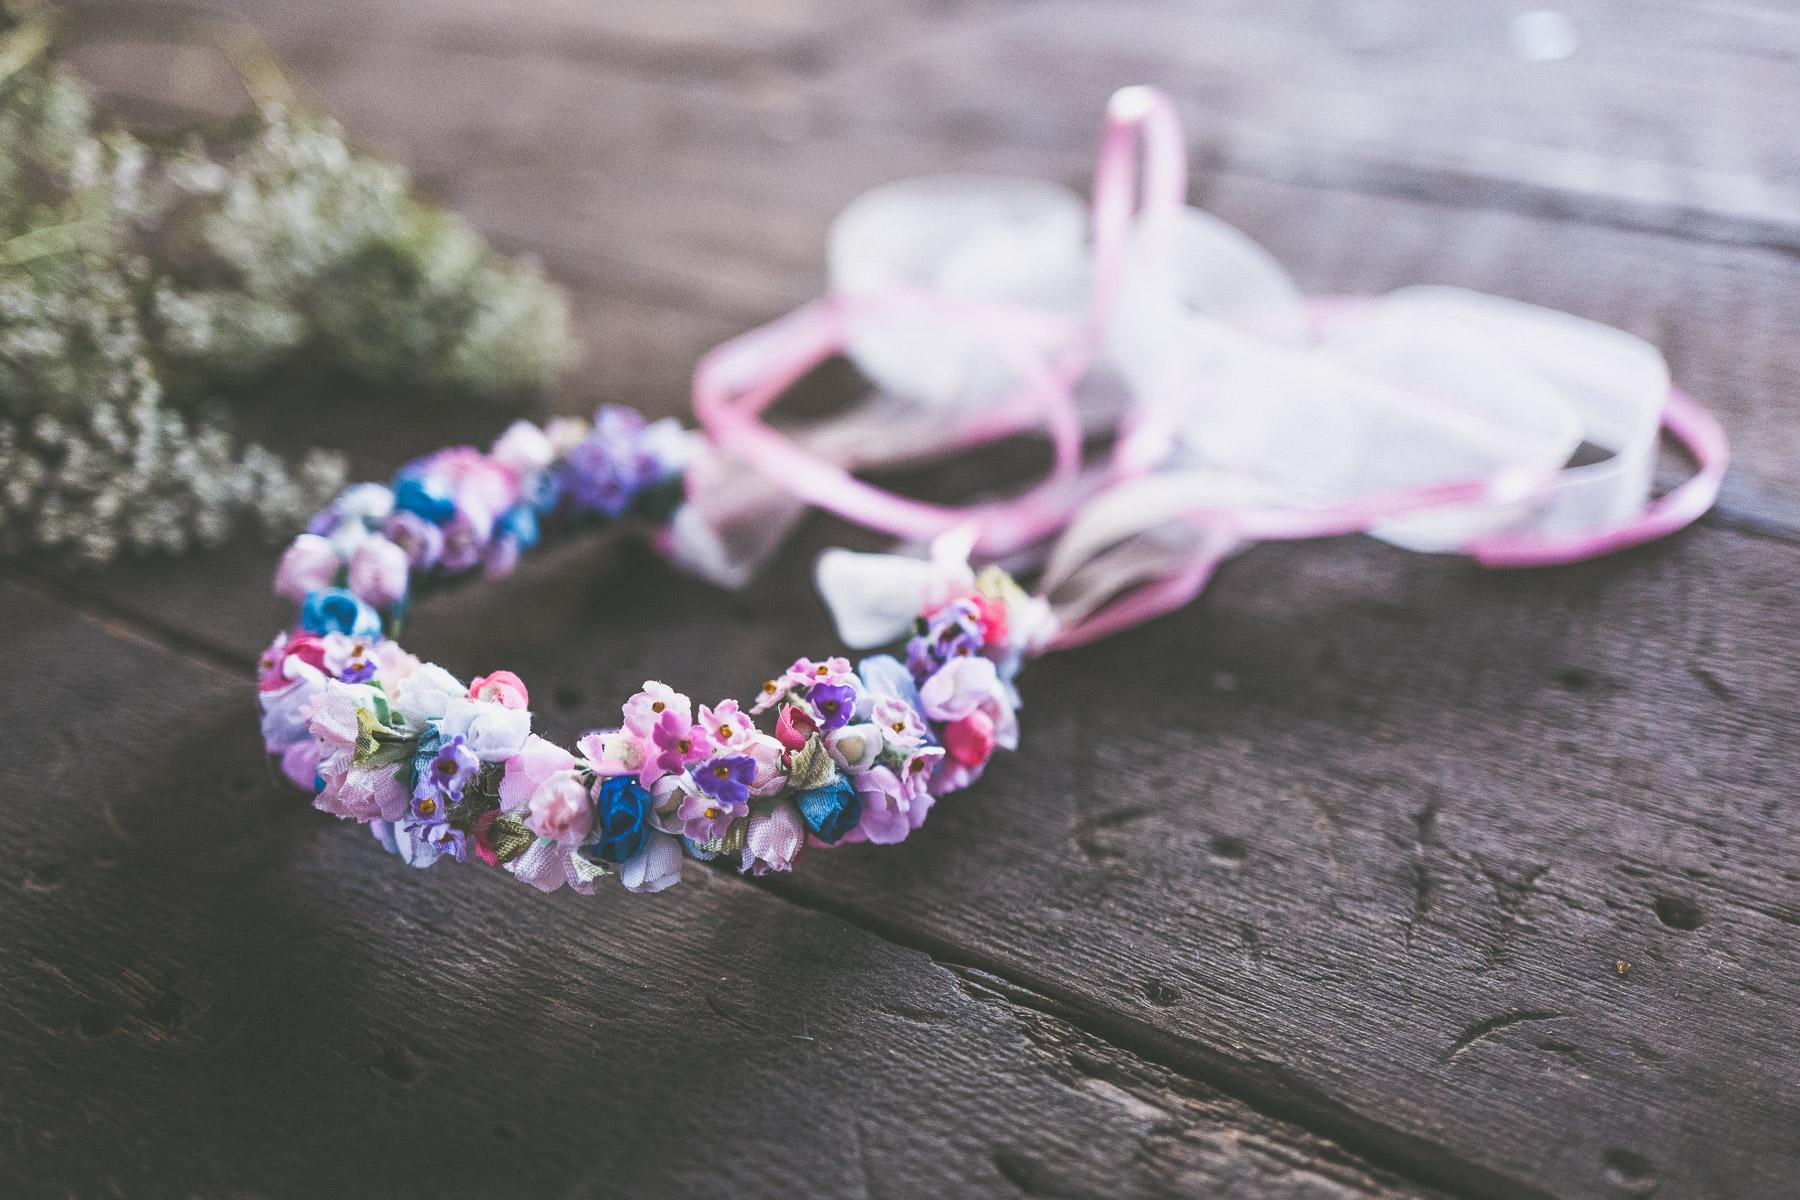 We-Are-Flowergirls_SS17_Couture-Collection_Blumenkranz_Flowercrown_012_1160660.jpg